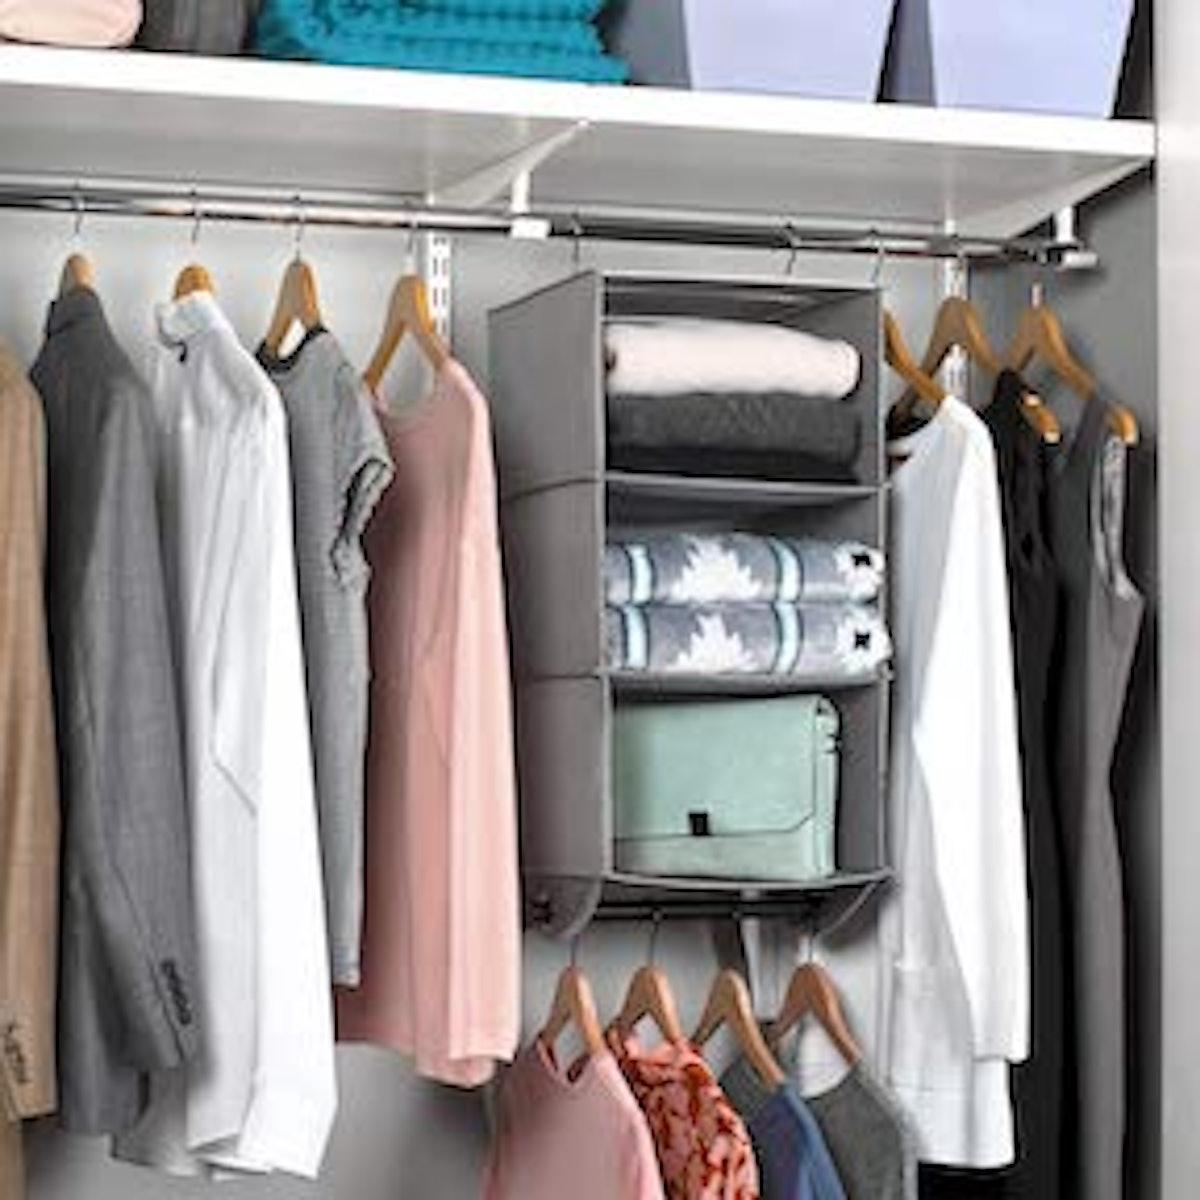 Hanging Closet Organizer with Garment Rod